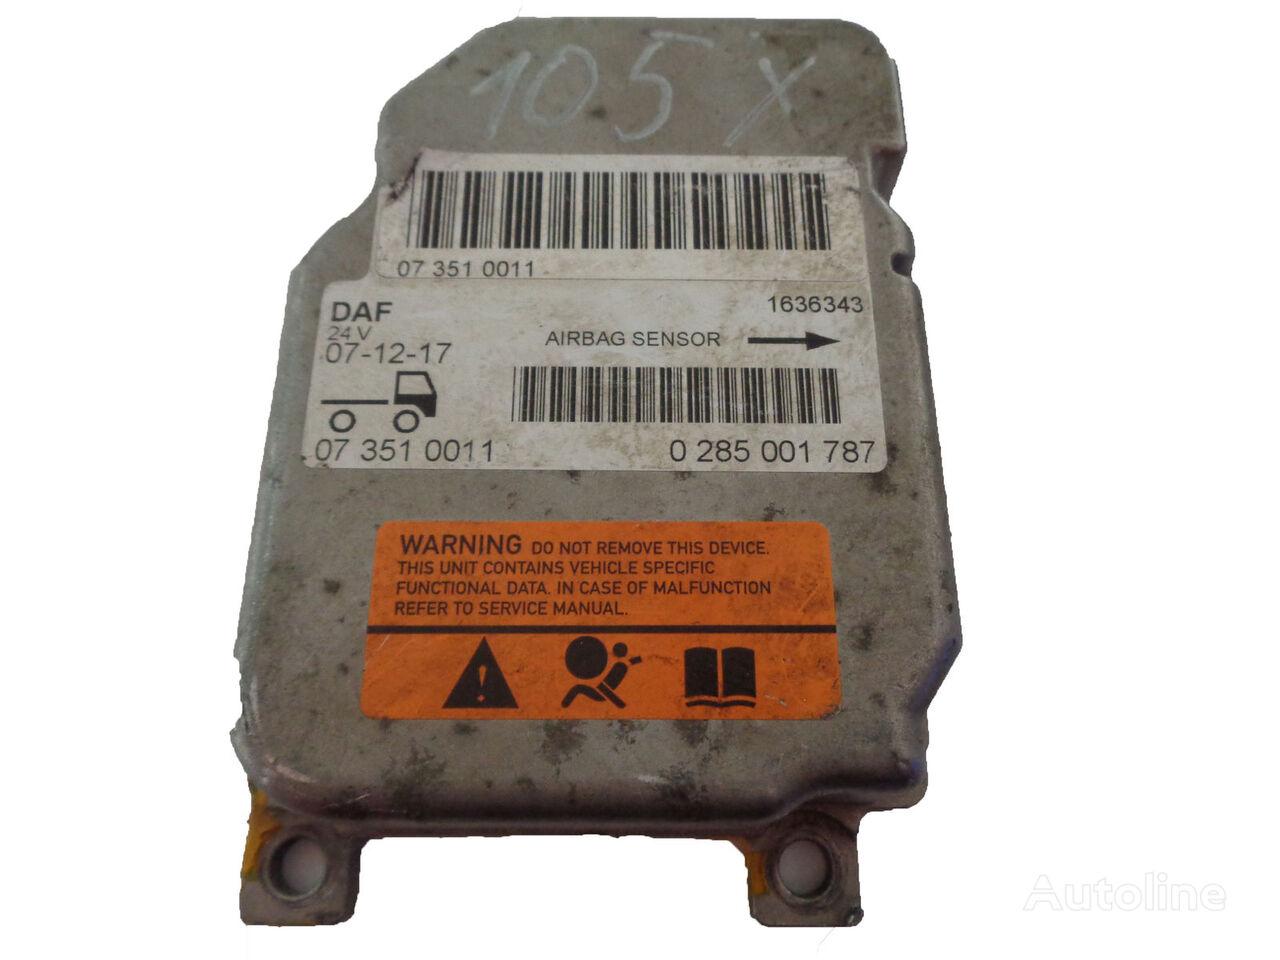 DAF AIRBAG Nr: 1636343 sensor for DAF XF 105 tractor unit